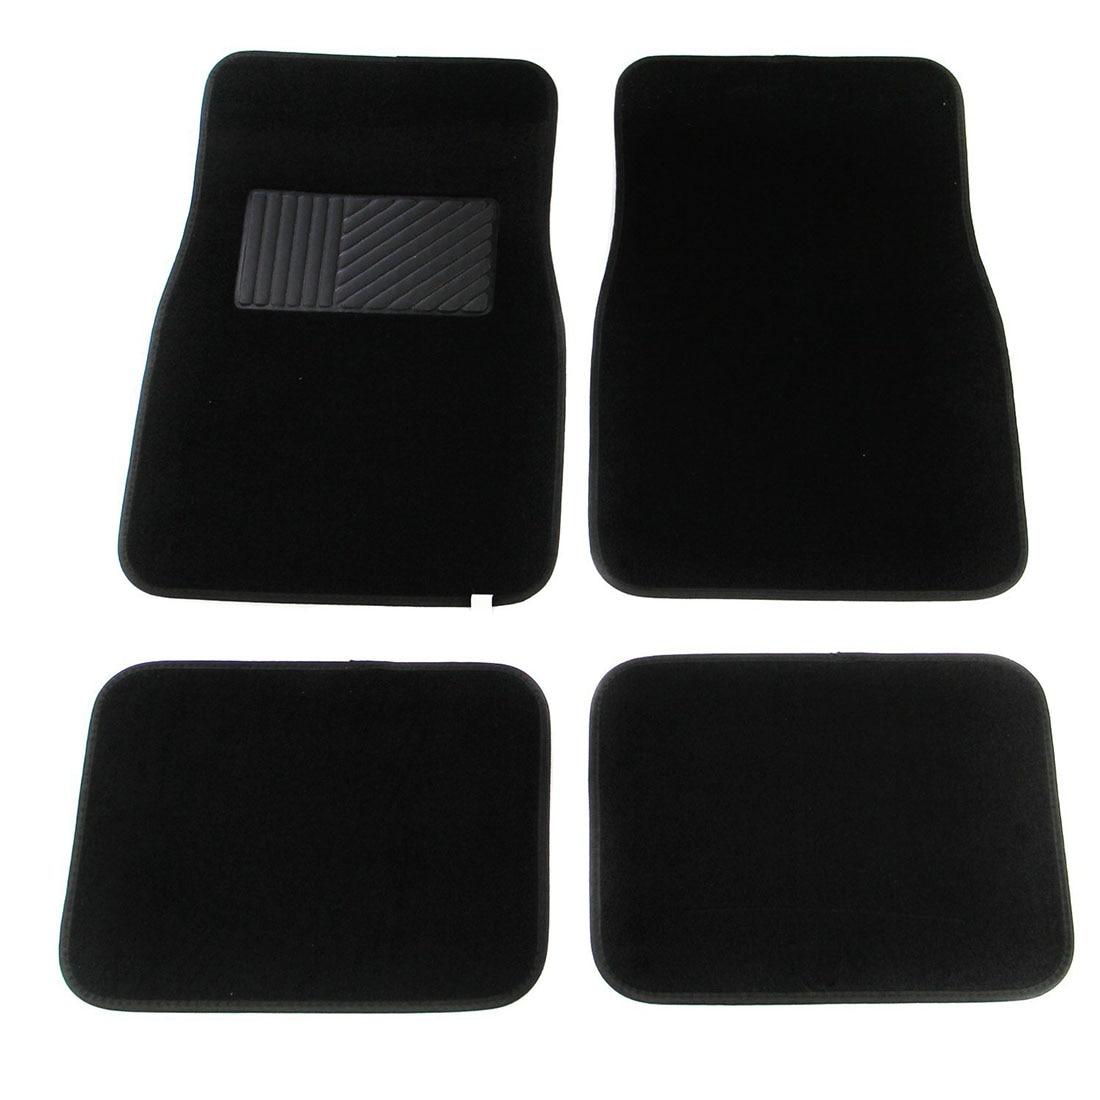 Auto multi season carpet floor mats 4pc set black fit most for 1 piece floor mats trucks